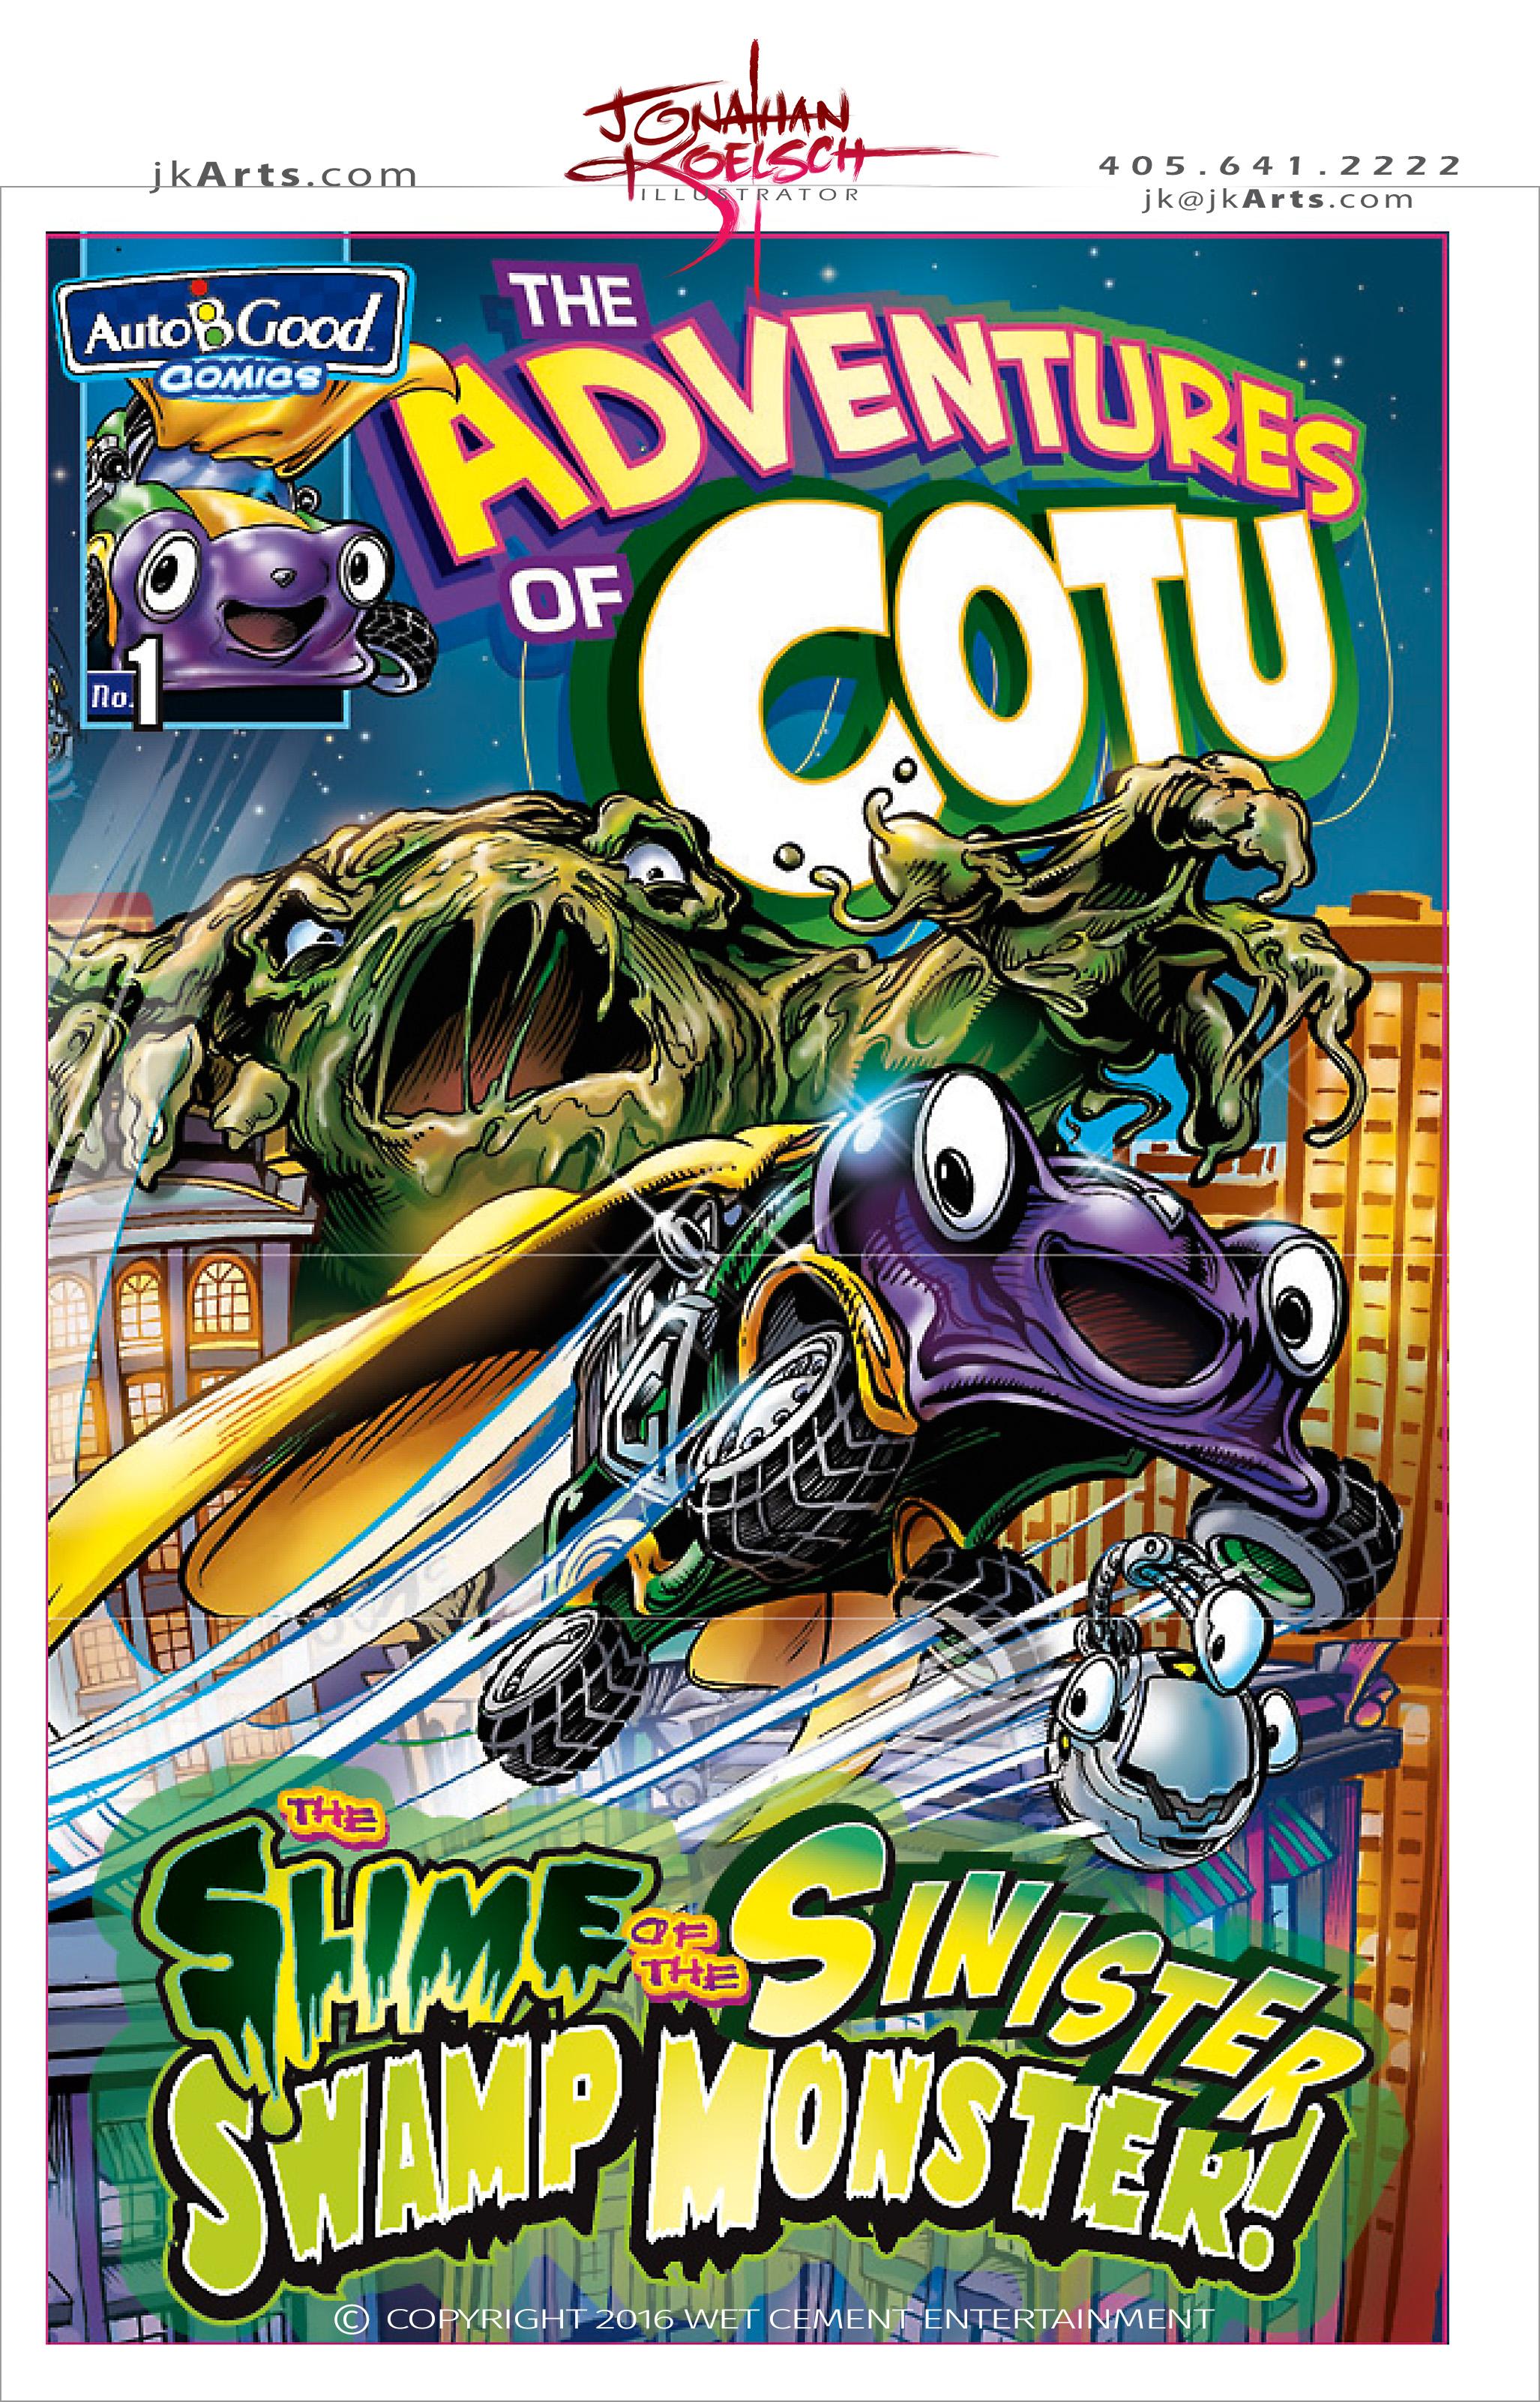 COTU AutoBGood Cover.jpg